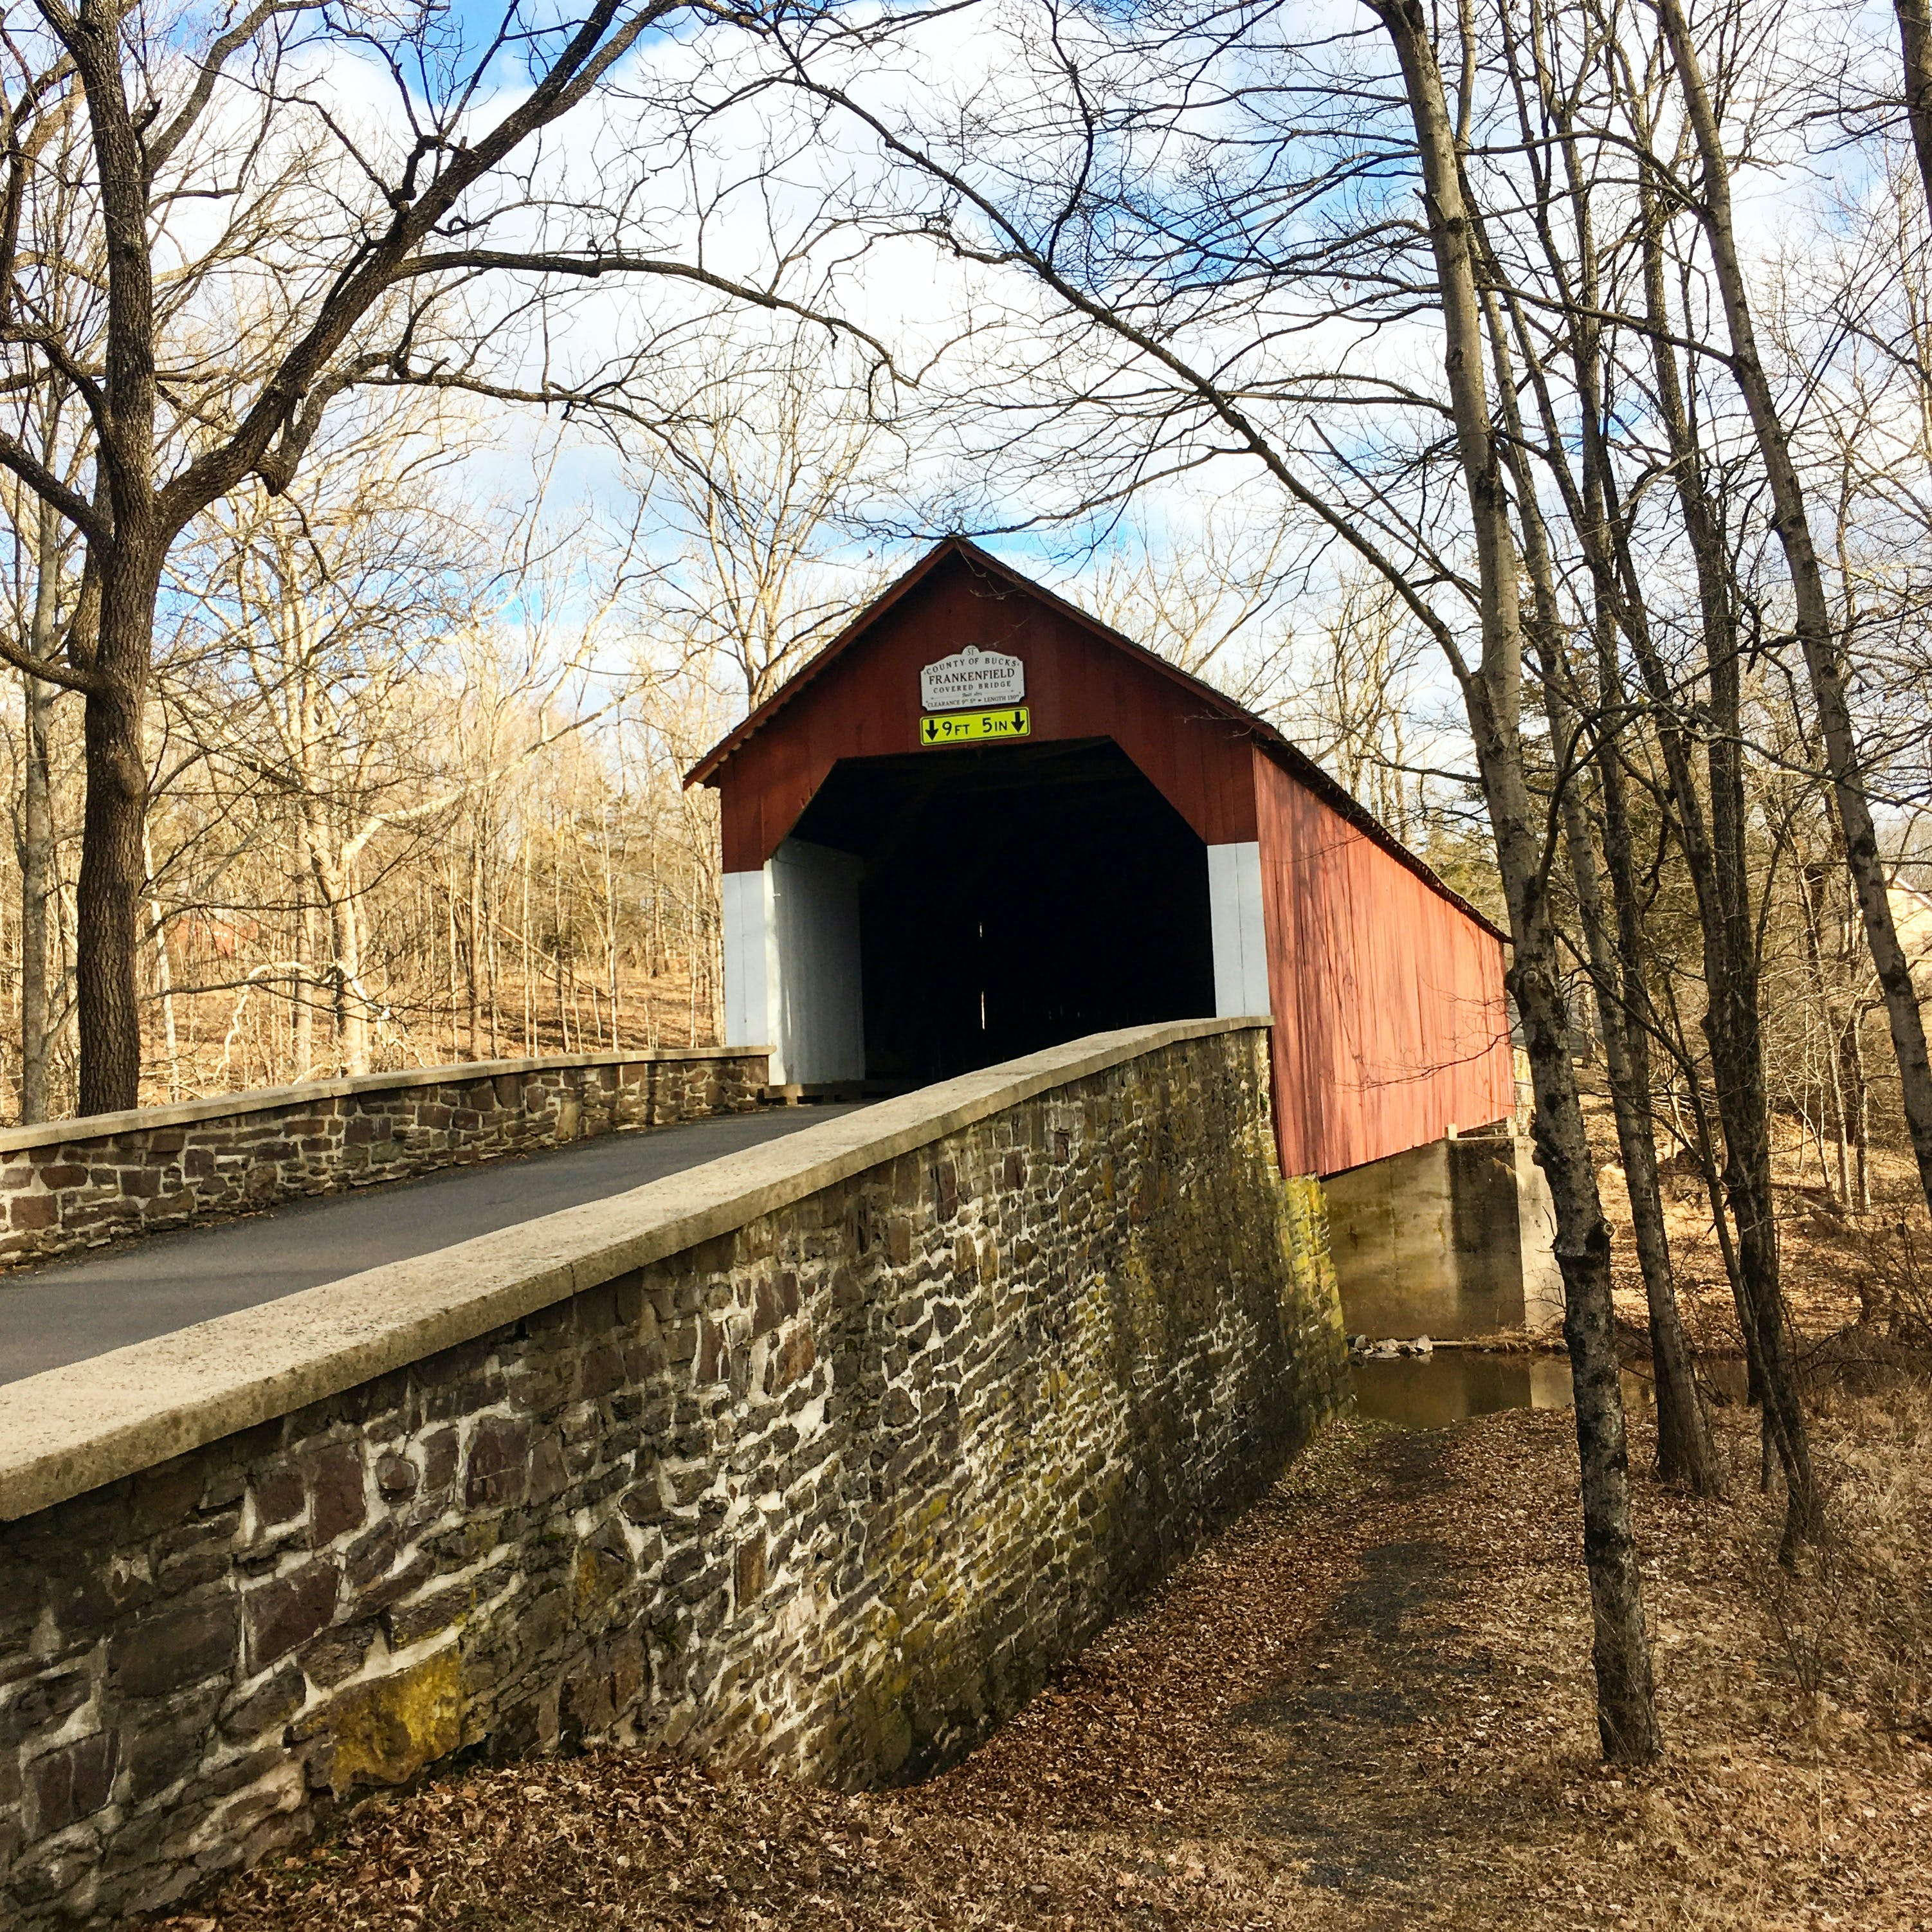 One of Bucks County, Pennslyvania Bridges